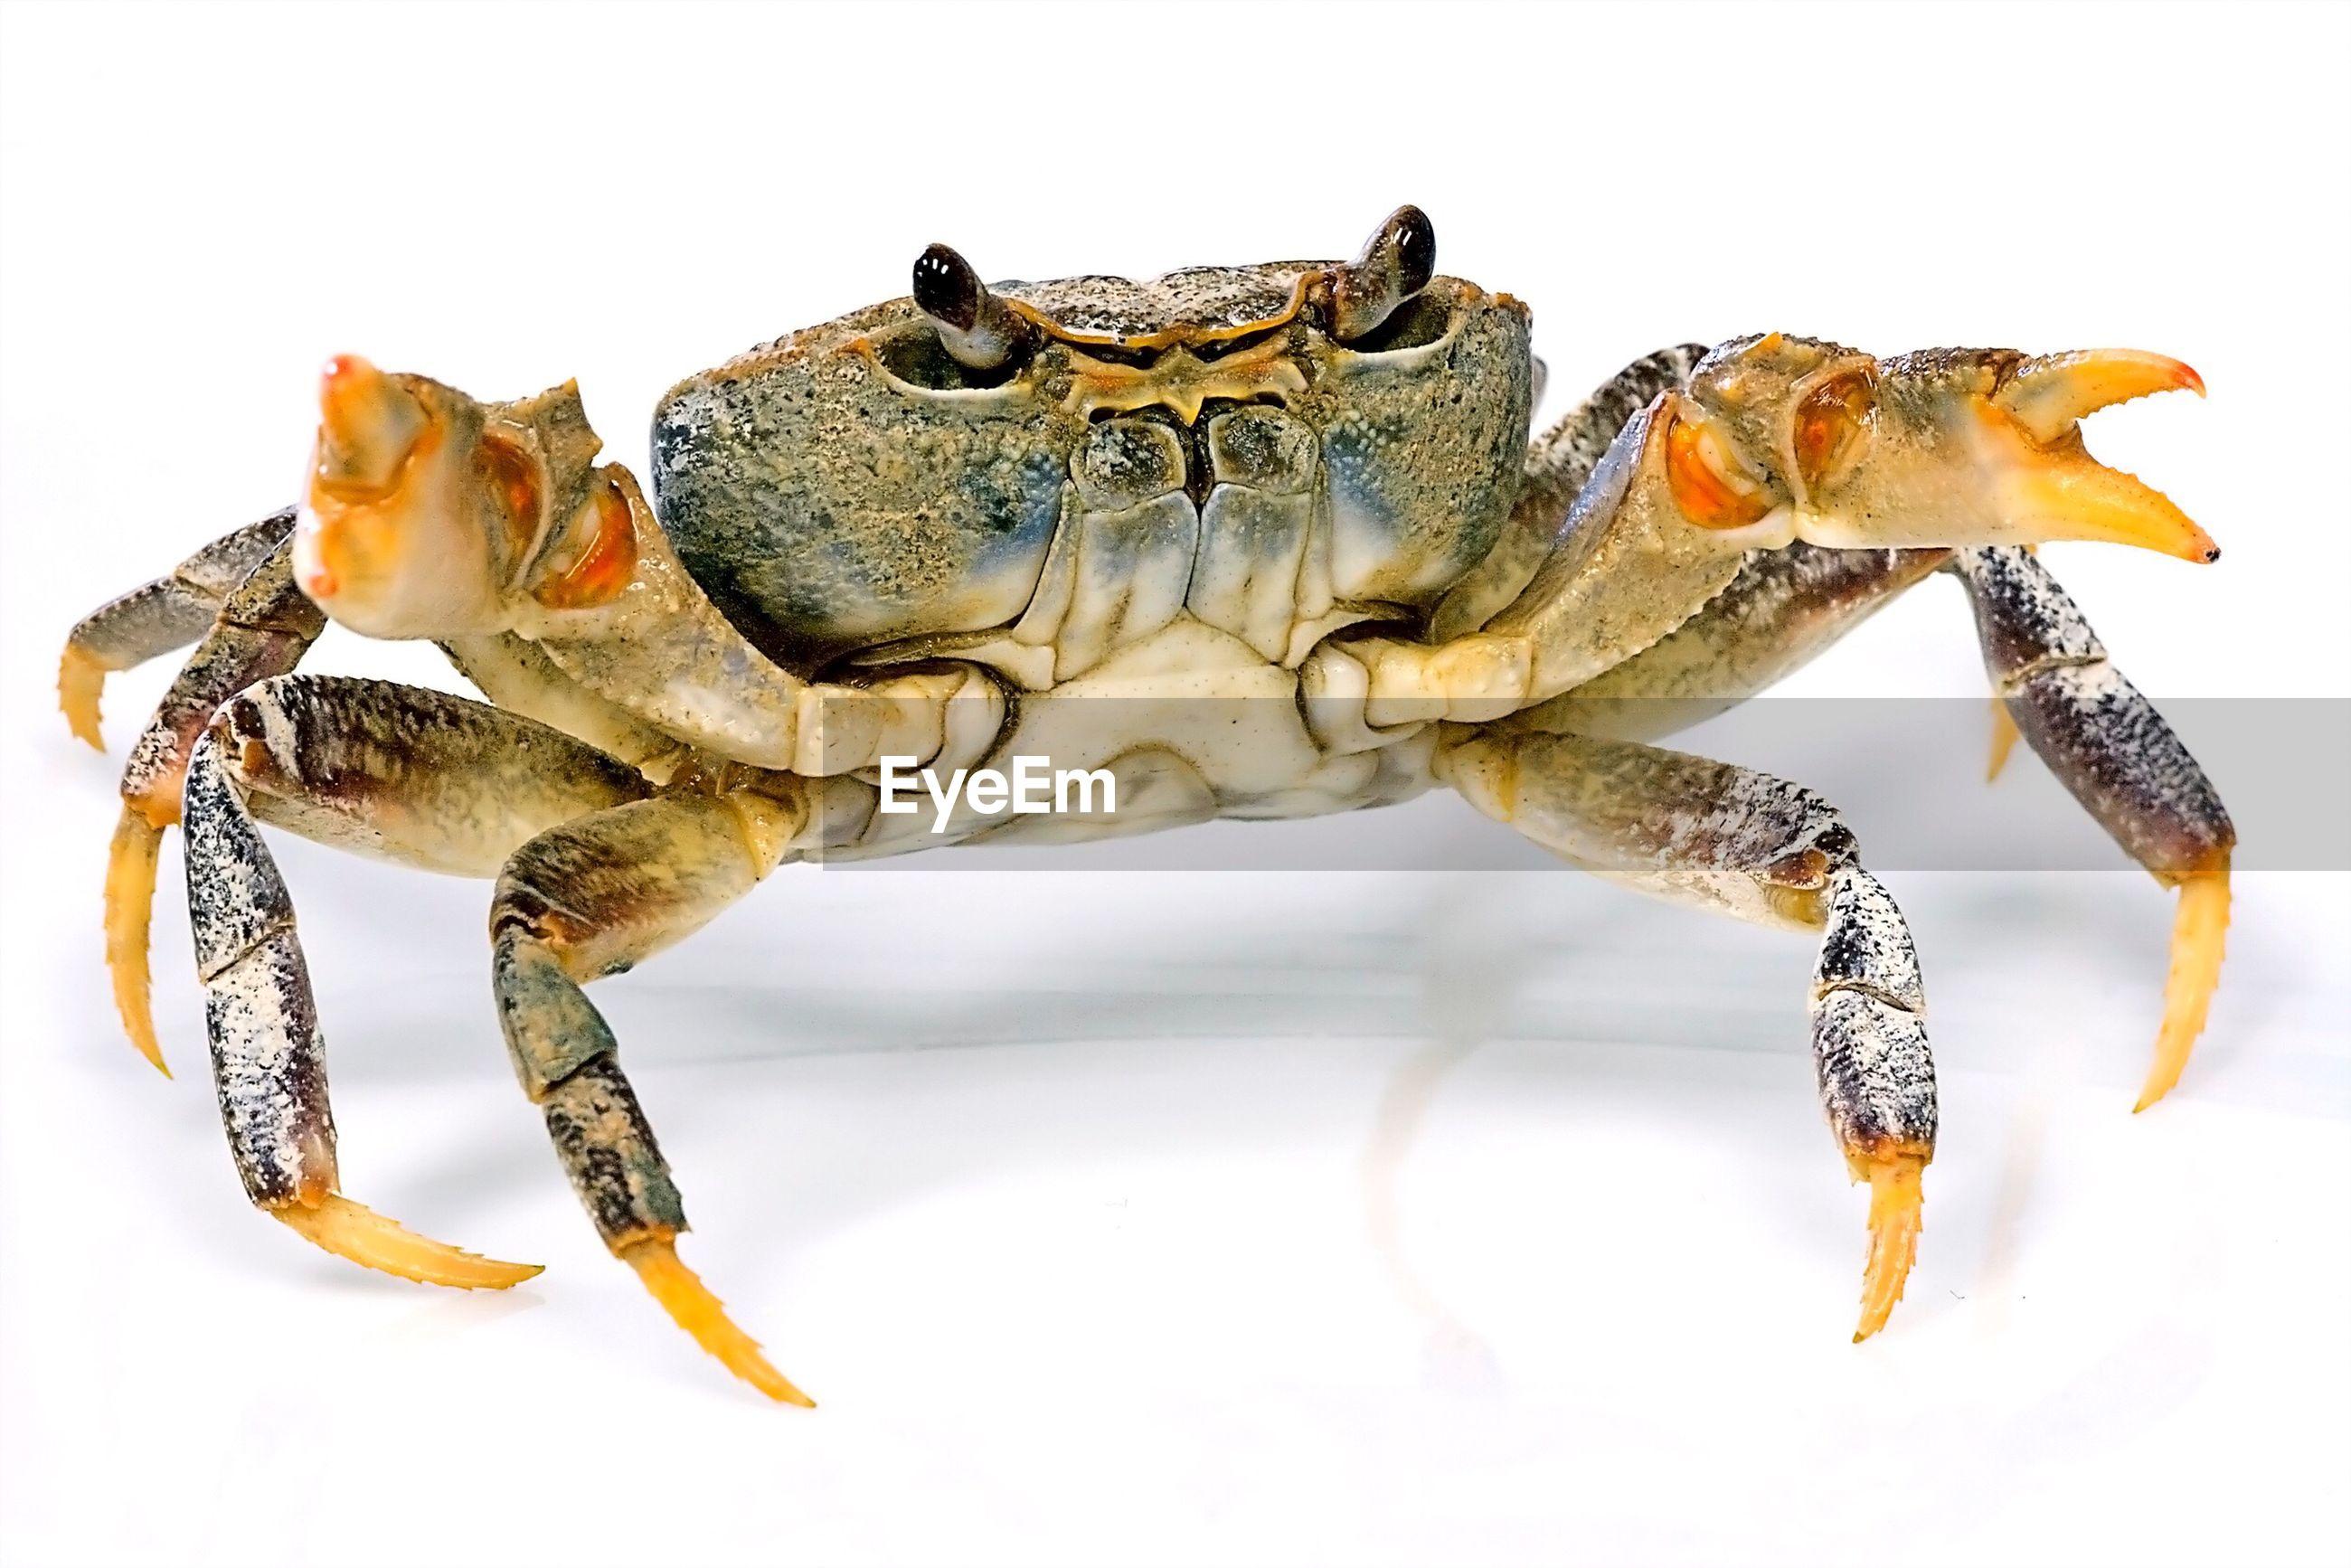 Studio shot of crab